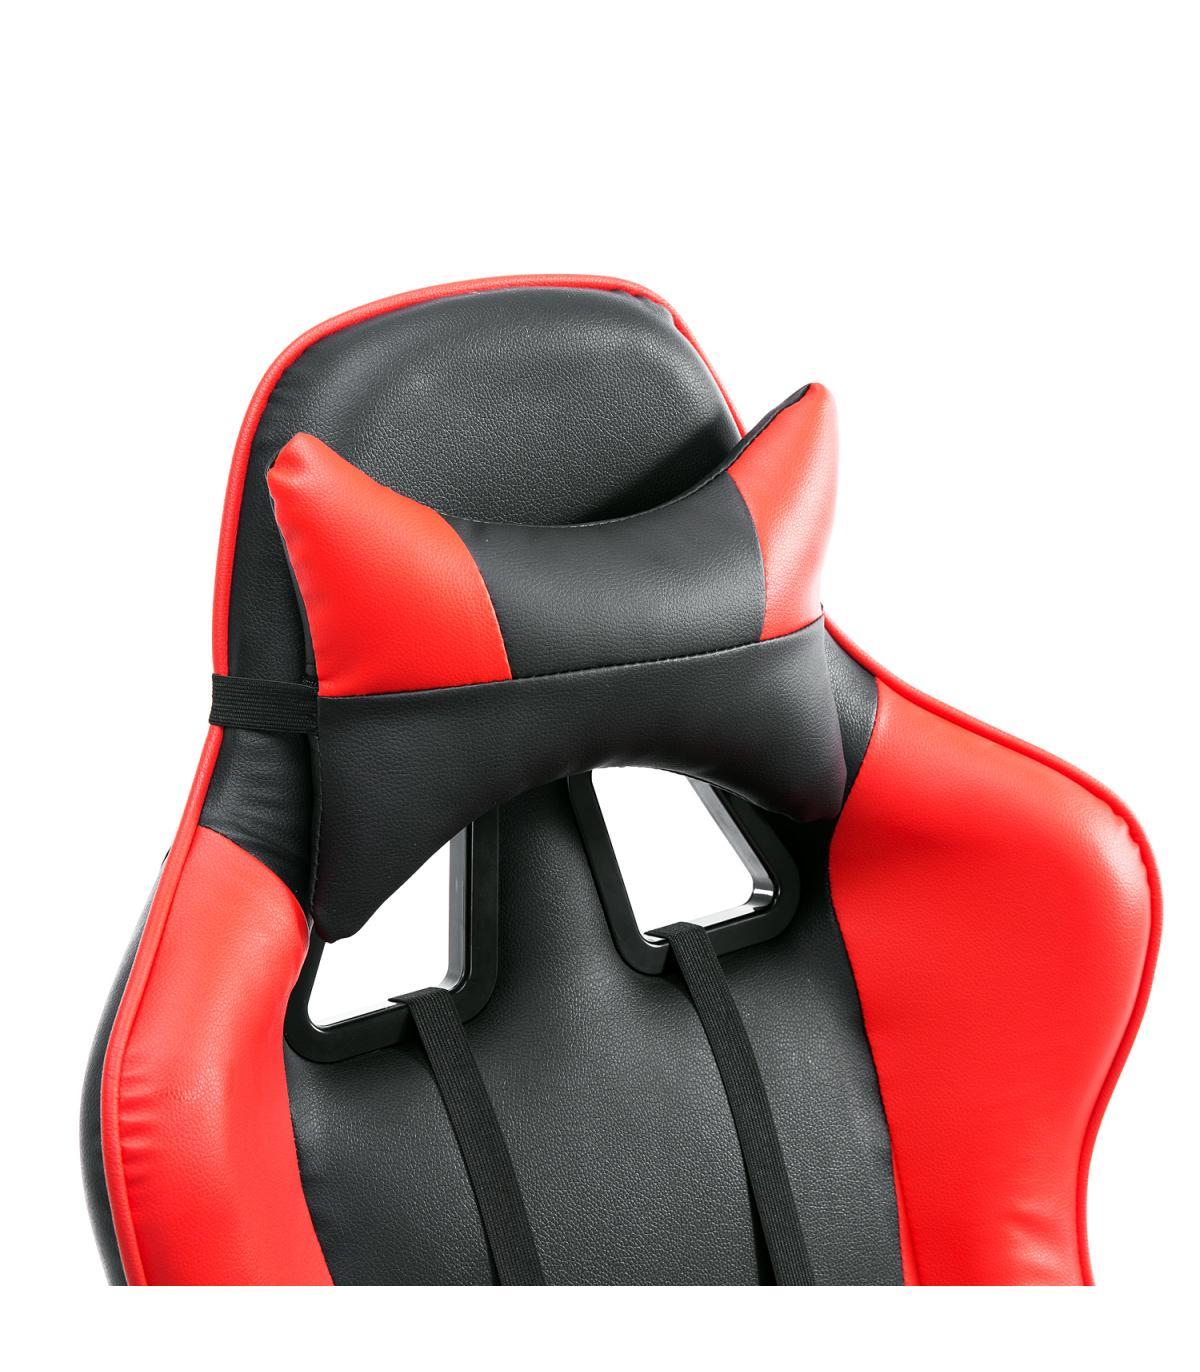 Silla De Negro Y Rojo Oficina Homcom® Elevable Giratoria mnv80Nw